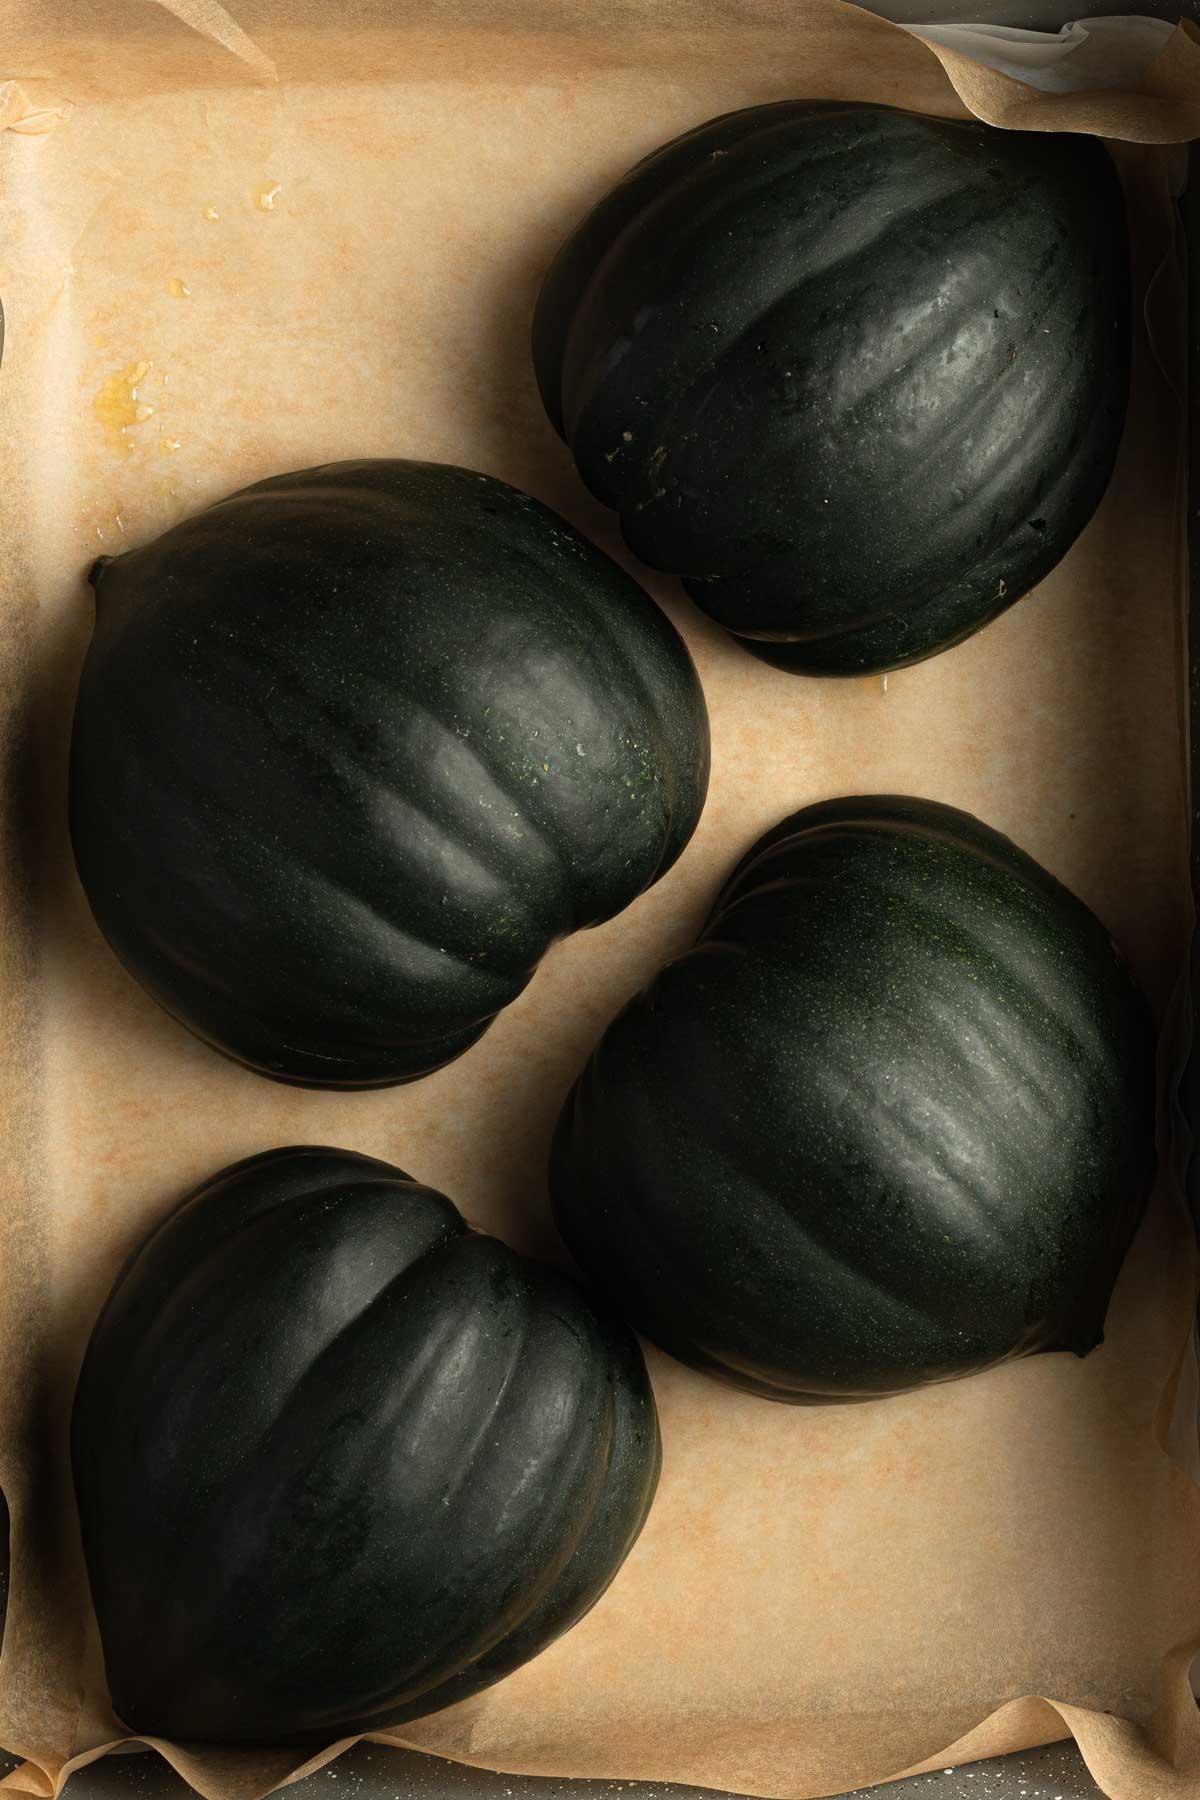 Acorn squash halves arranged cut side down in a roasting pan.